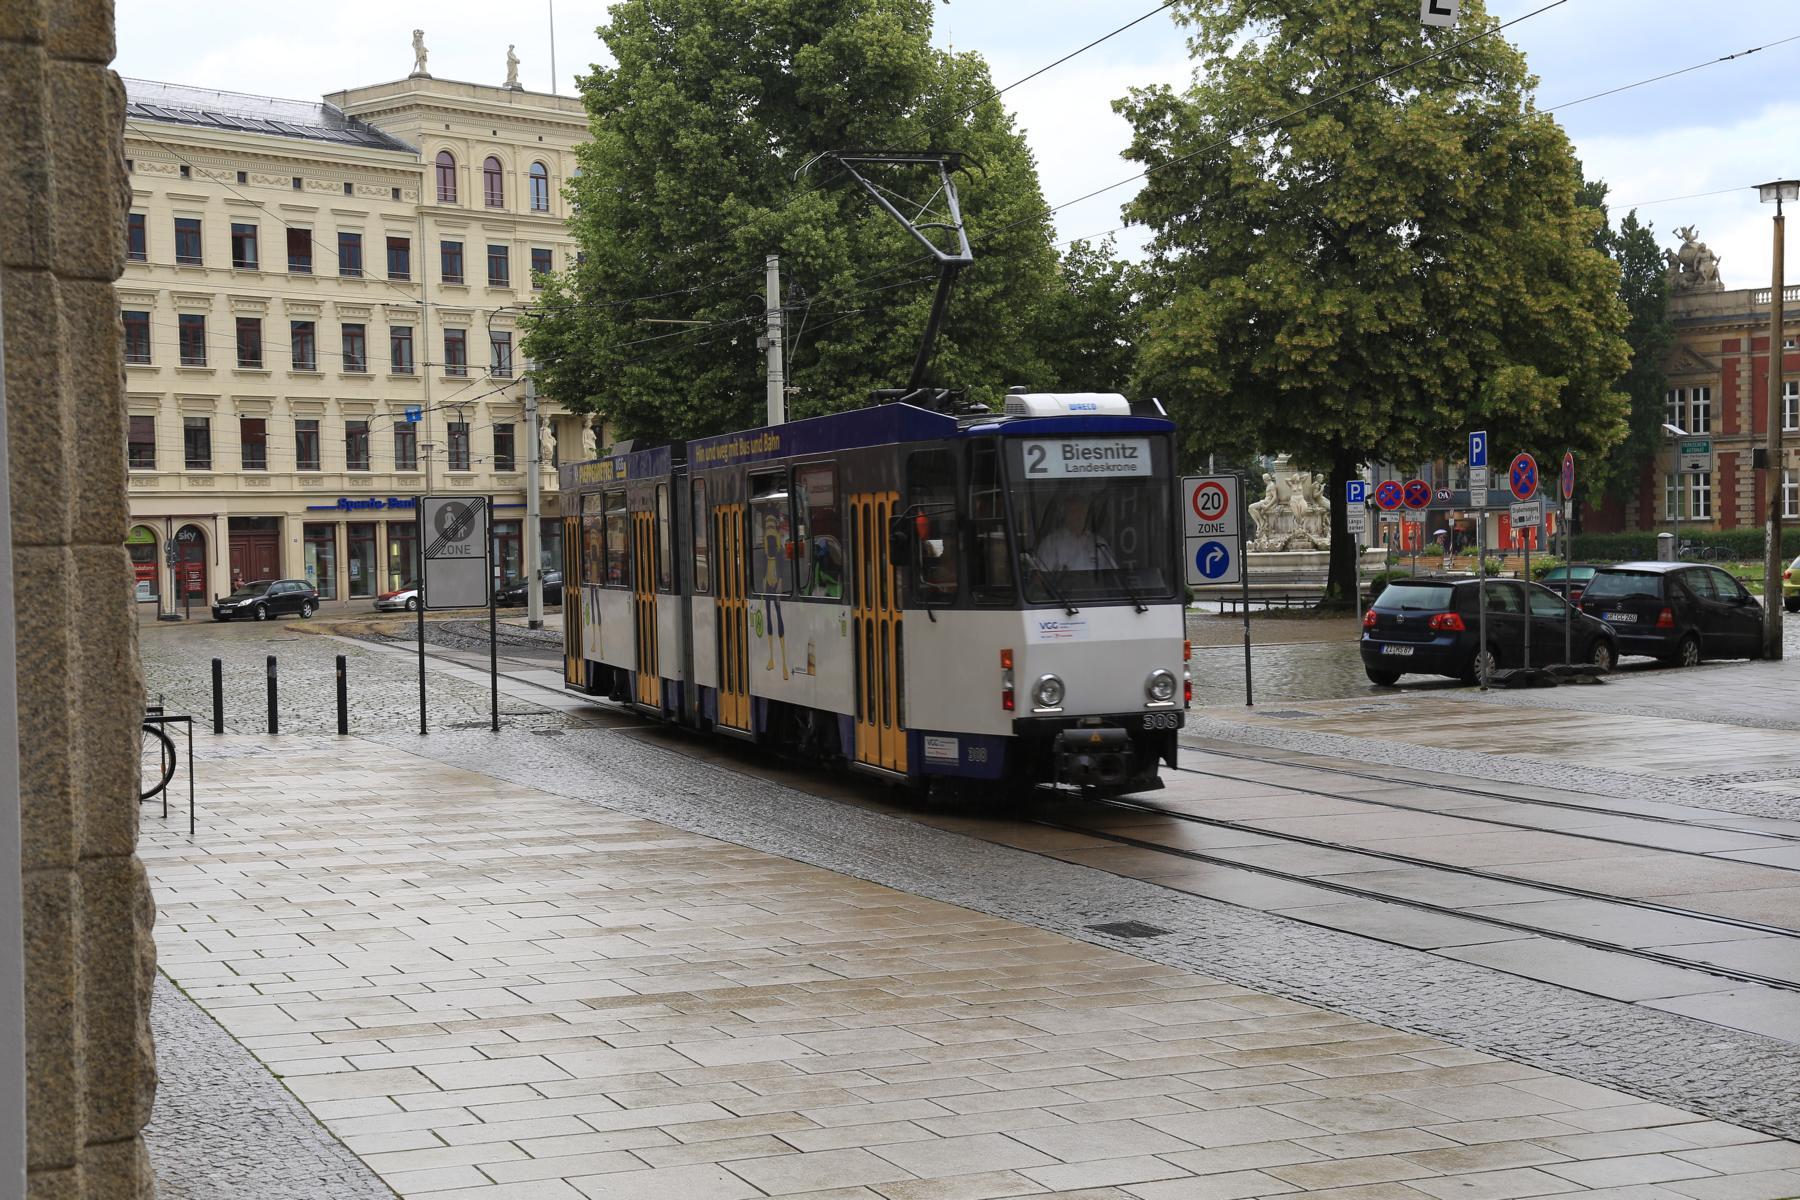 Filestraßenbahnlinie 2 Görlitzjpg Wikimedia Commons